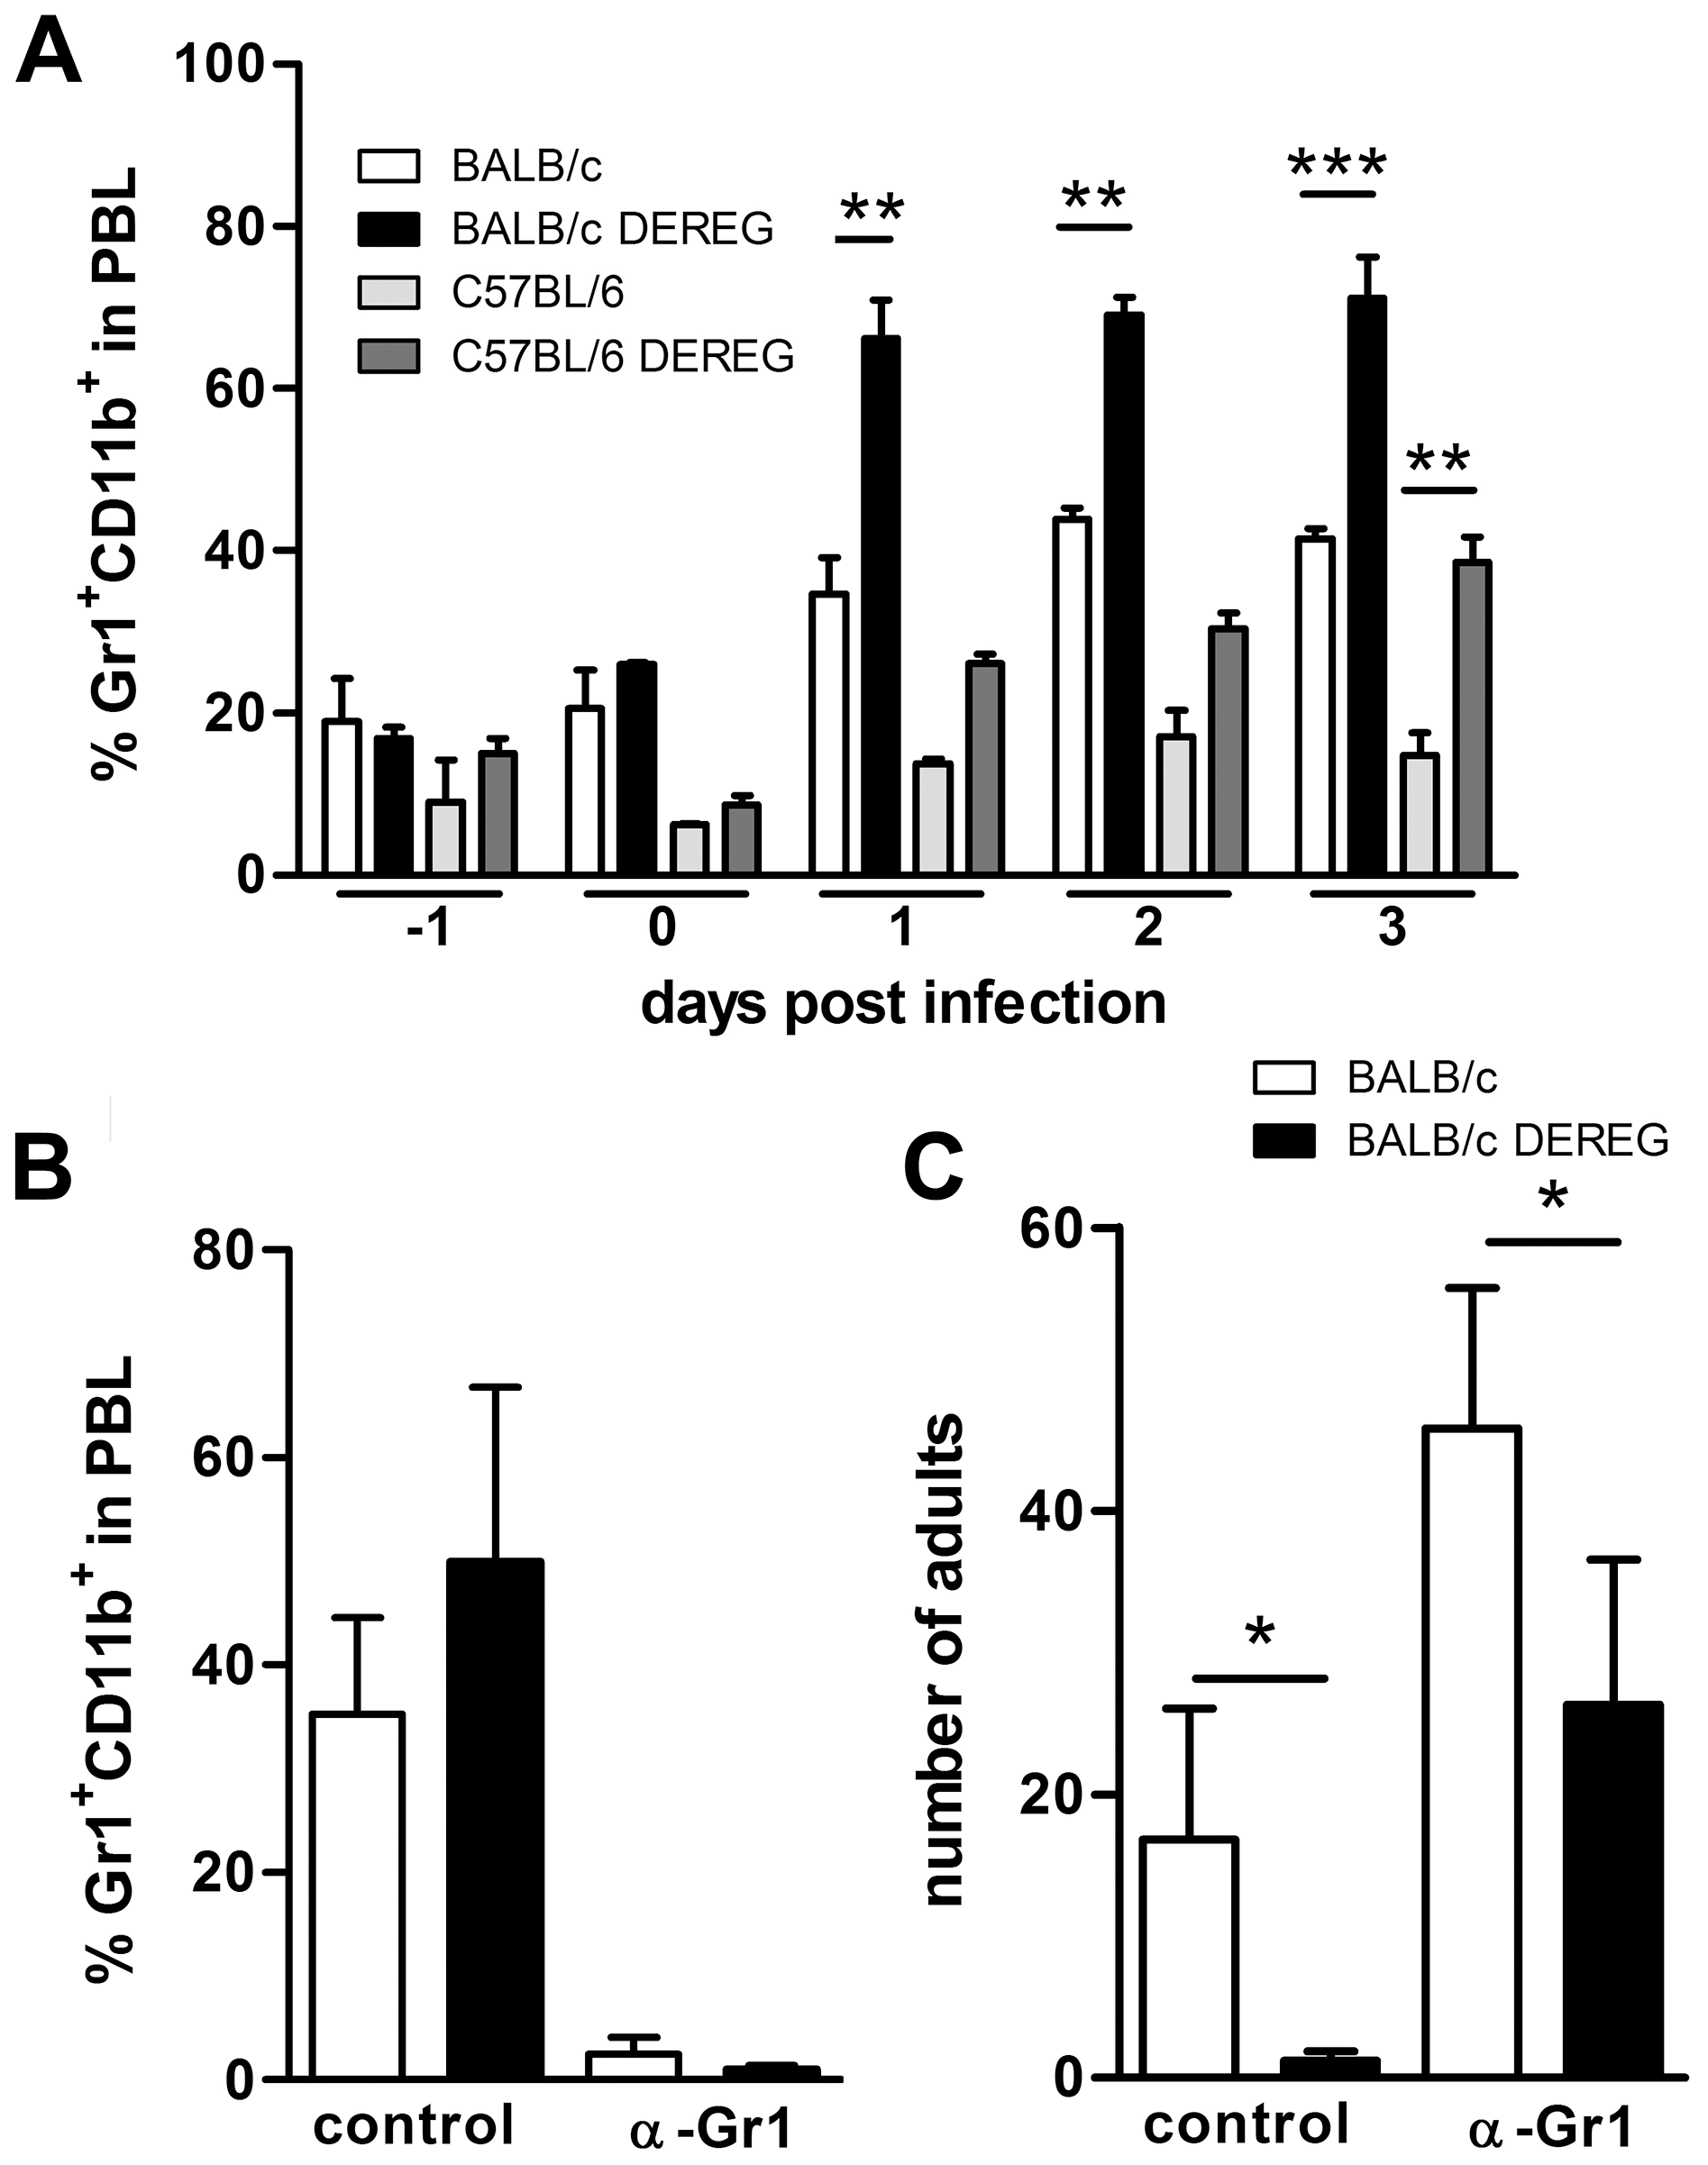 Improved resistance in Treg-depleted BALB/c DEREG mice in the absence of granulocytes.